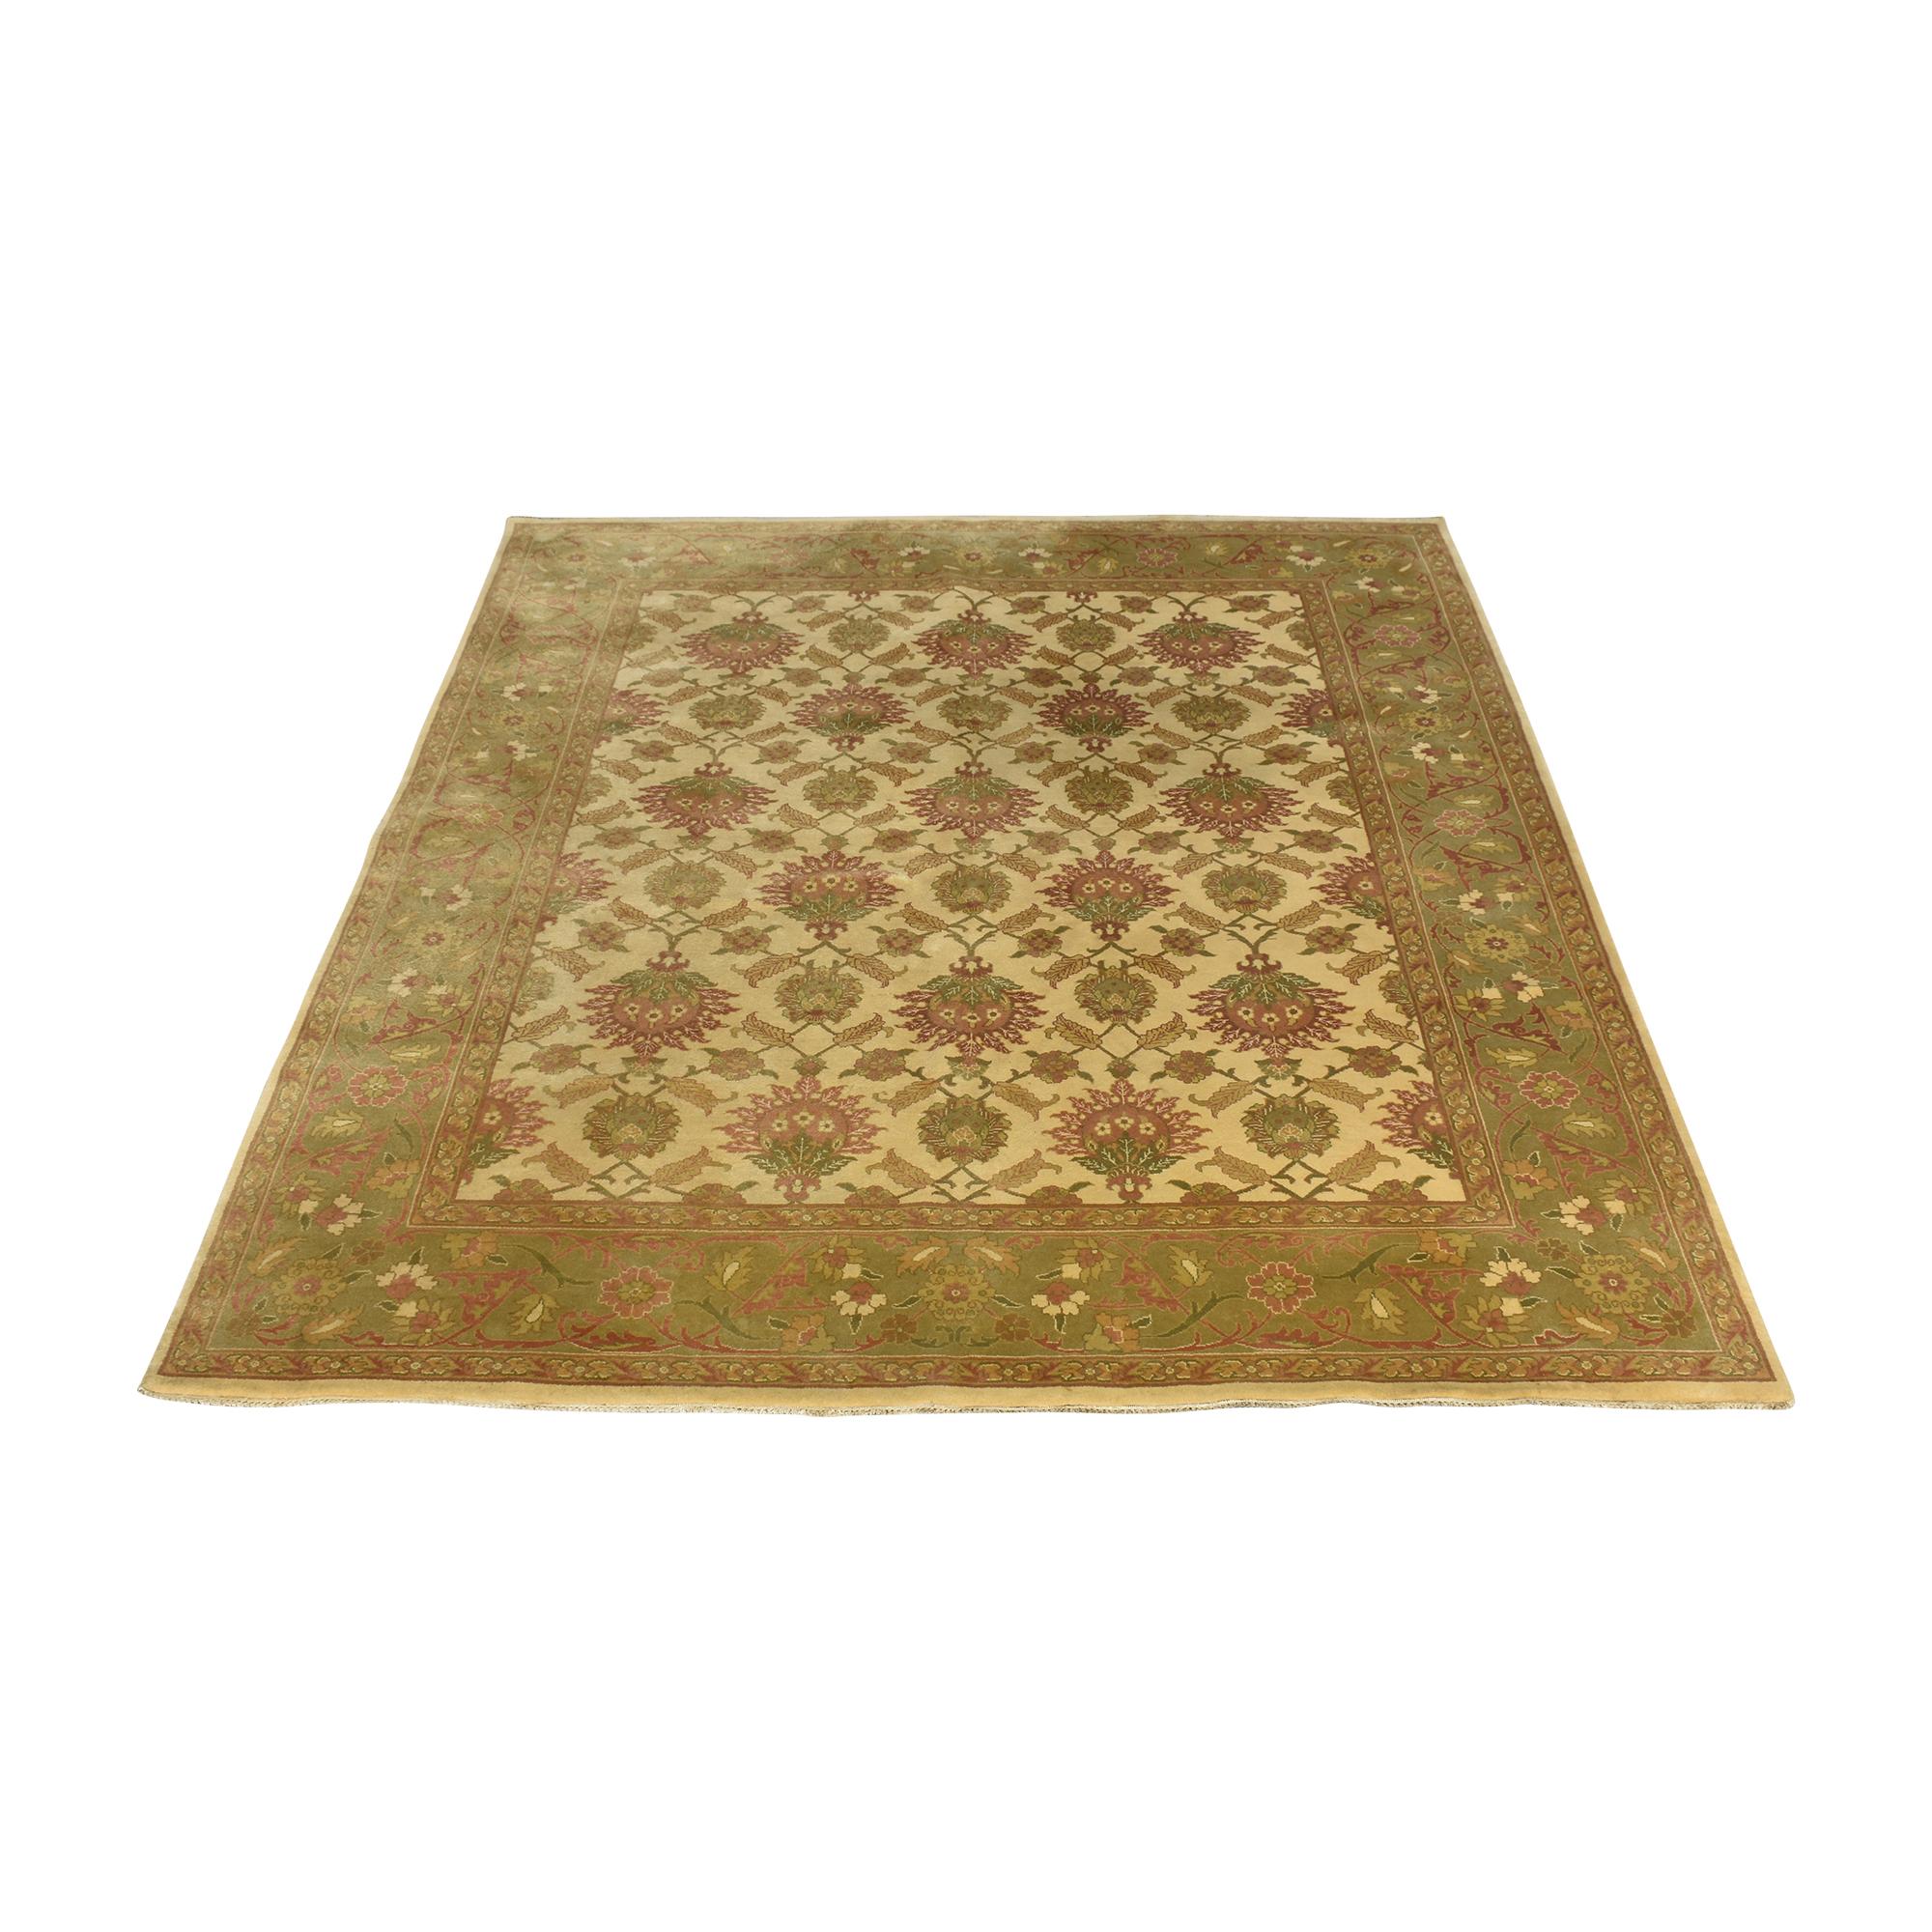 ABC Carpet & Home Persian-Style Area Rug sale